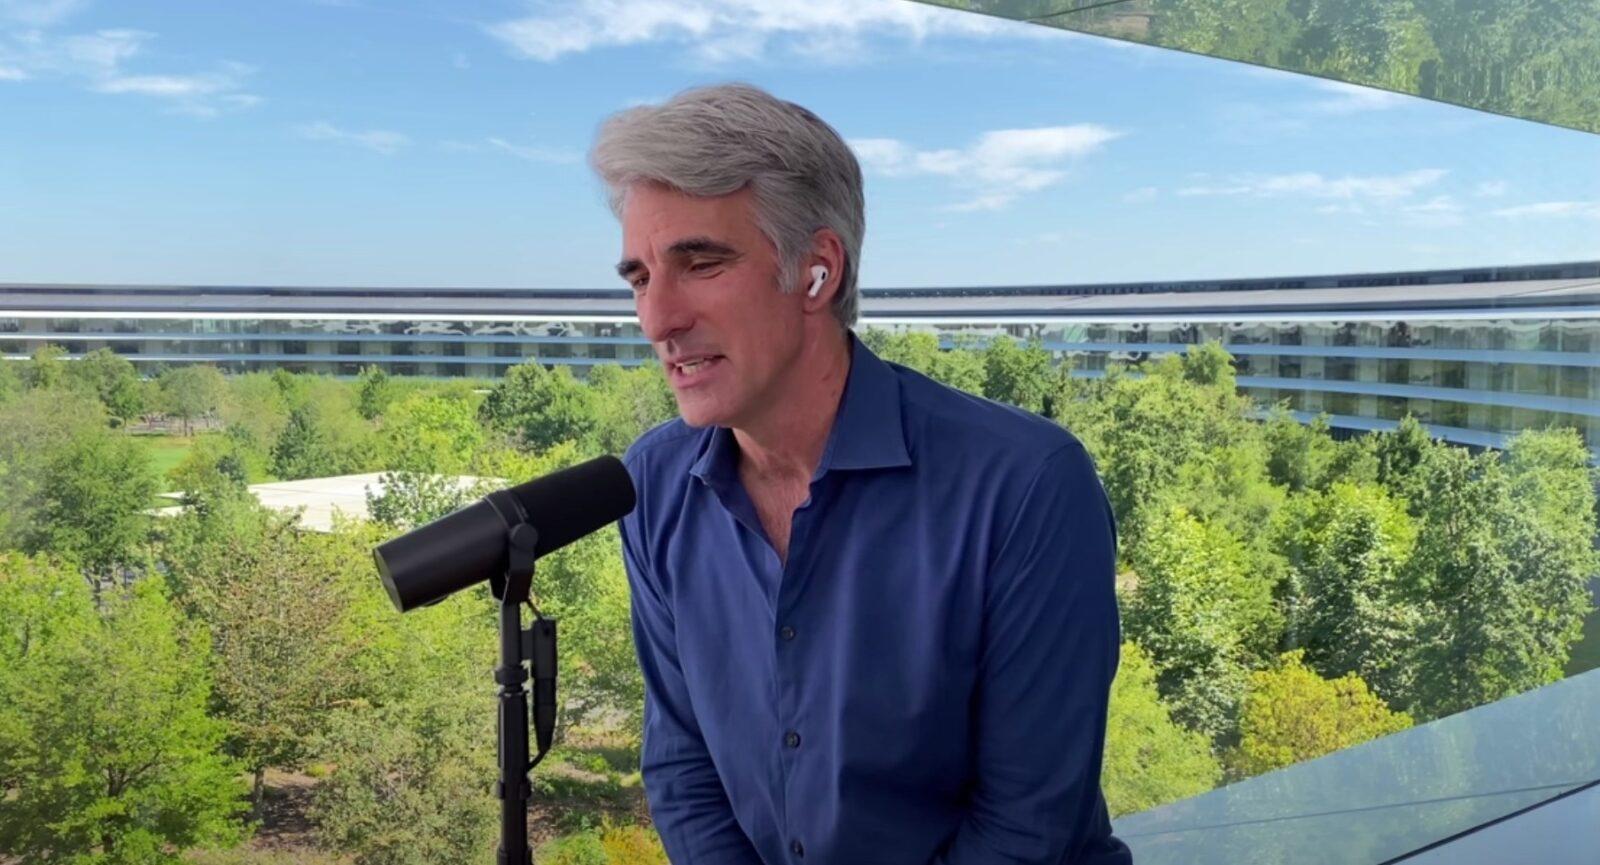 Craigh Federighi risponde alle domande di MKBHD su macOS Big Sure, iOS 14 e iPad